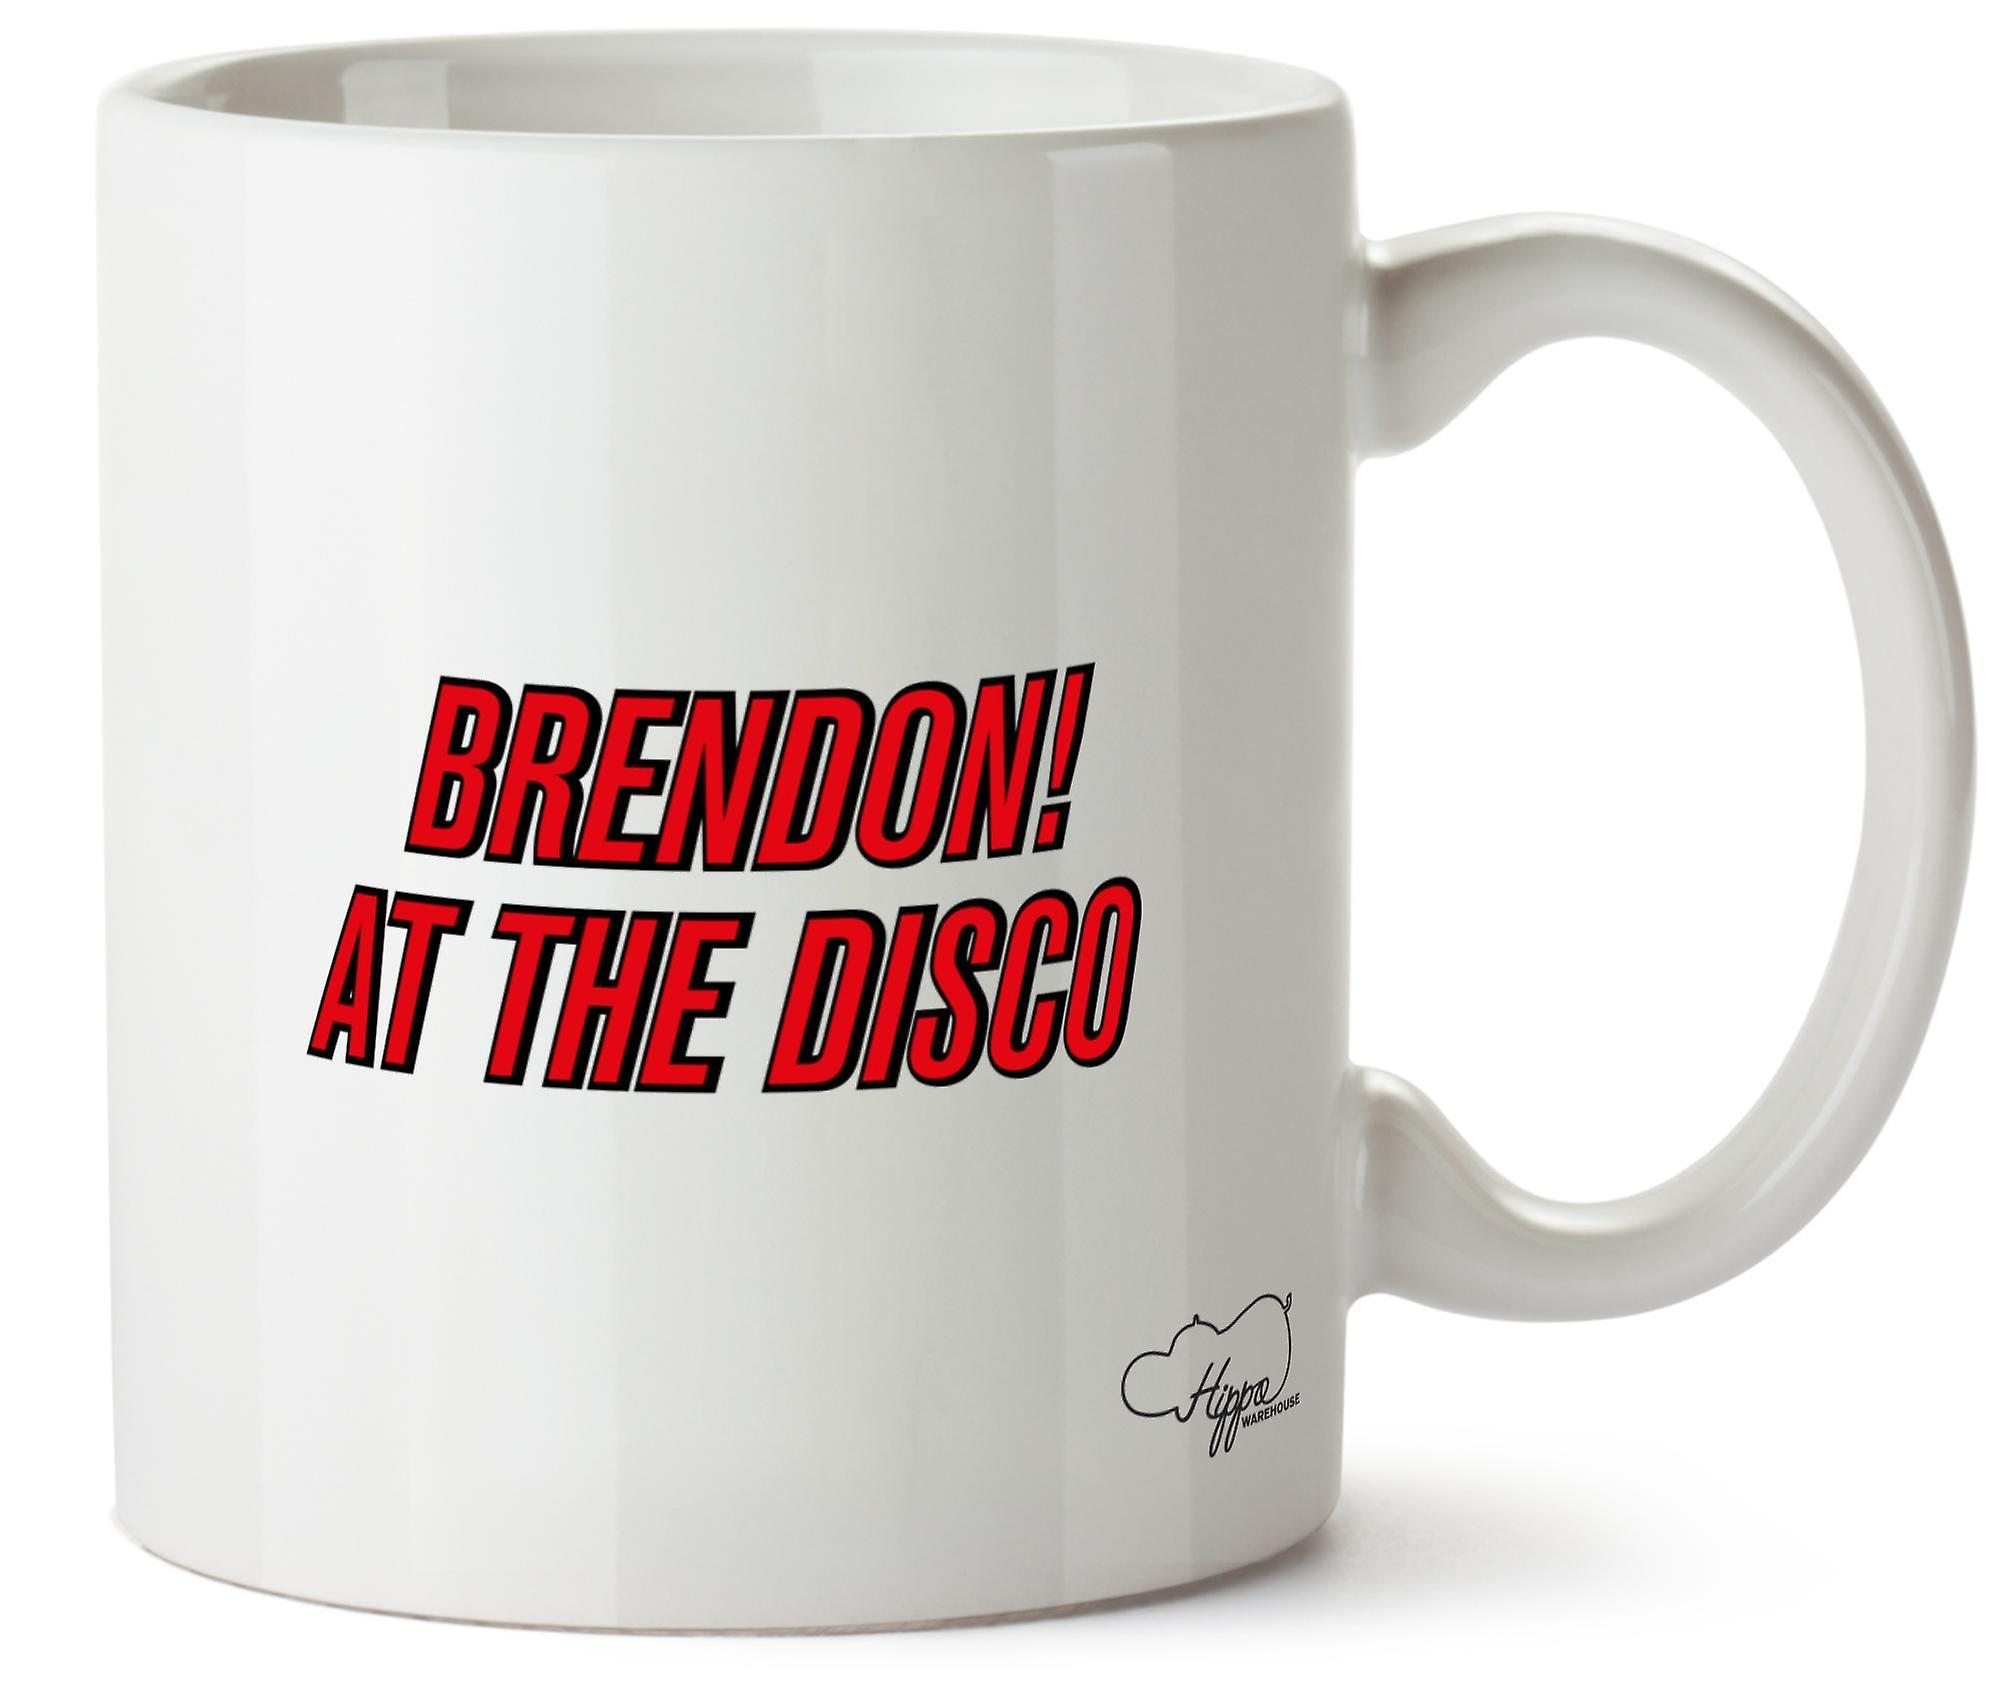 Imprimé Brendon Tasse 10oz Hippowarehouse The Céramique En nbsp;At Disco IvYy6gbf7